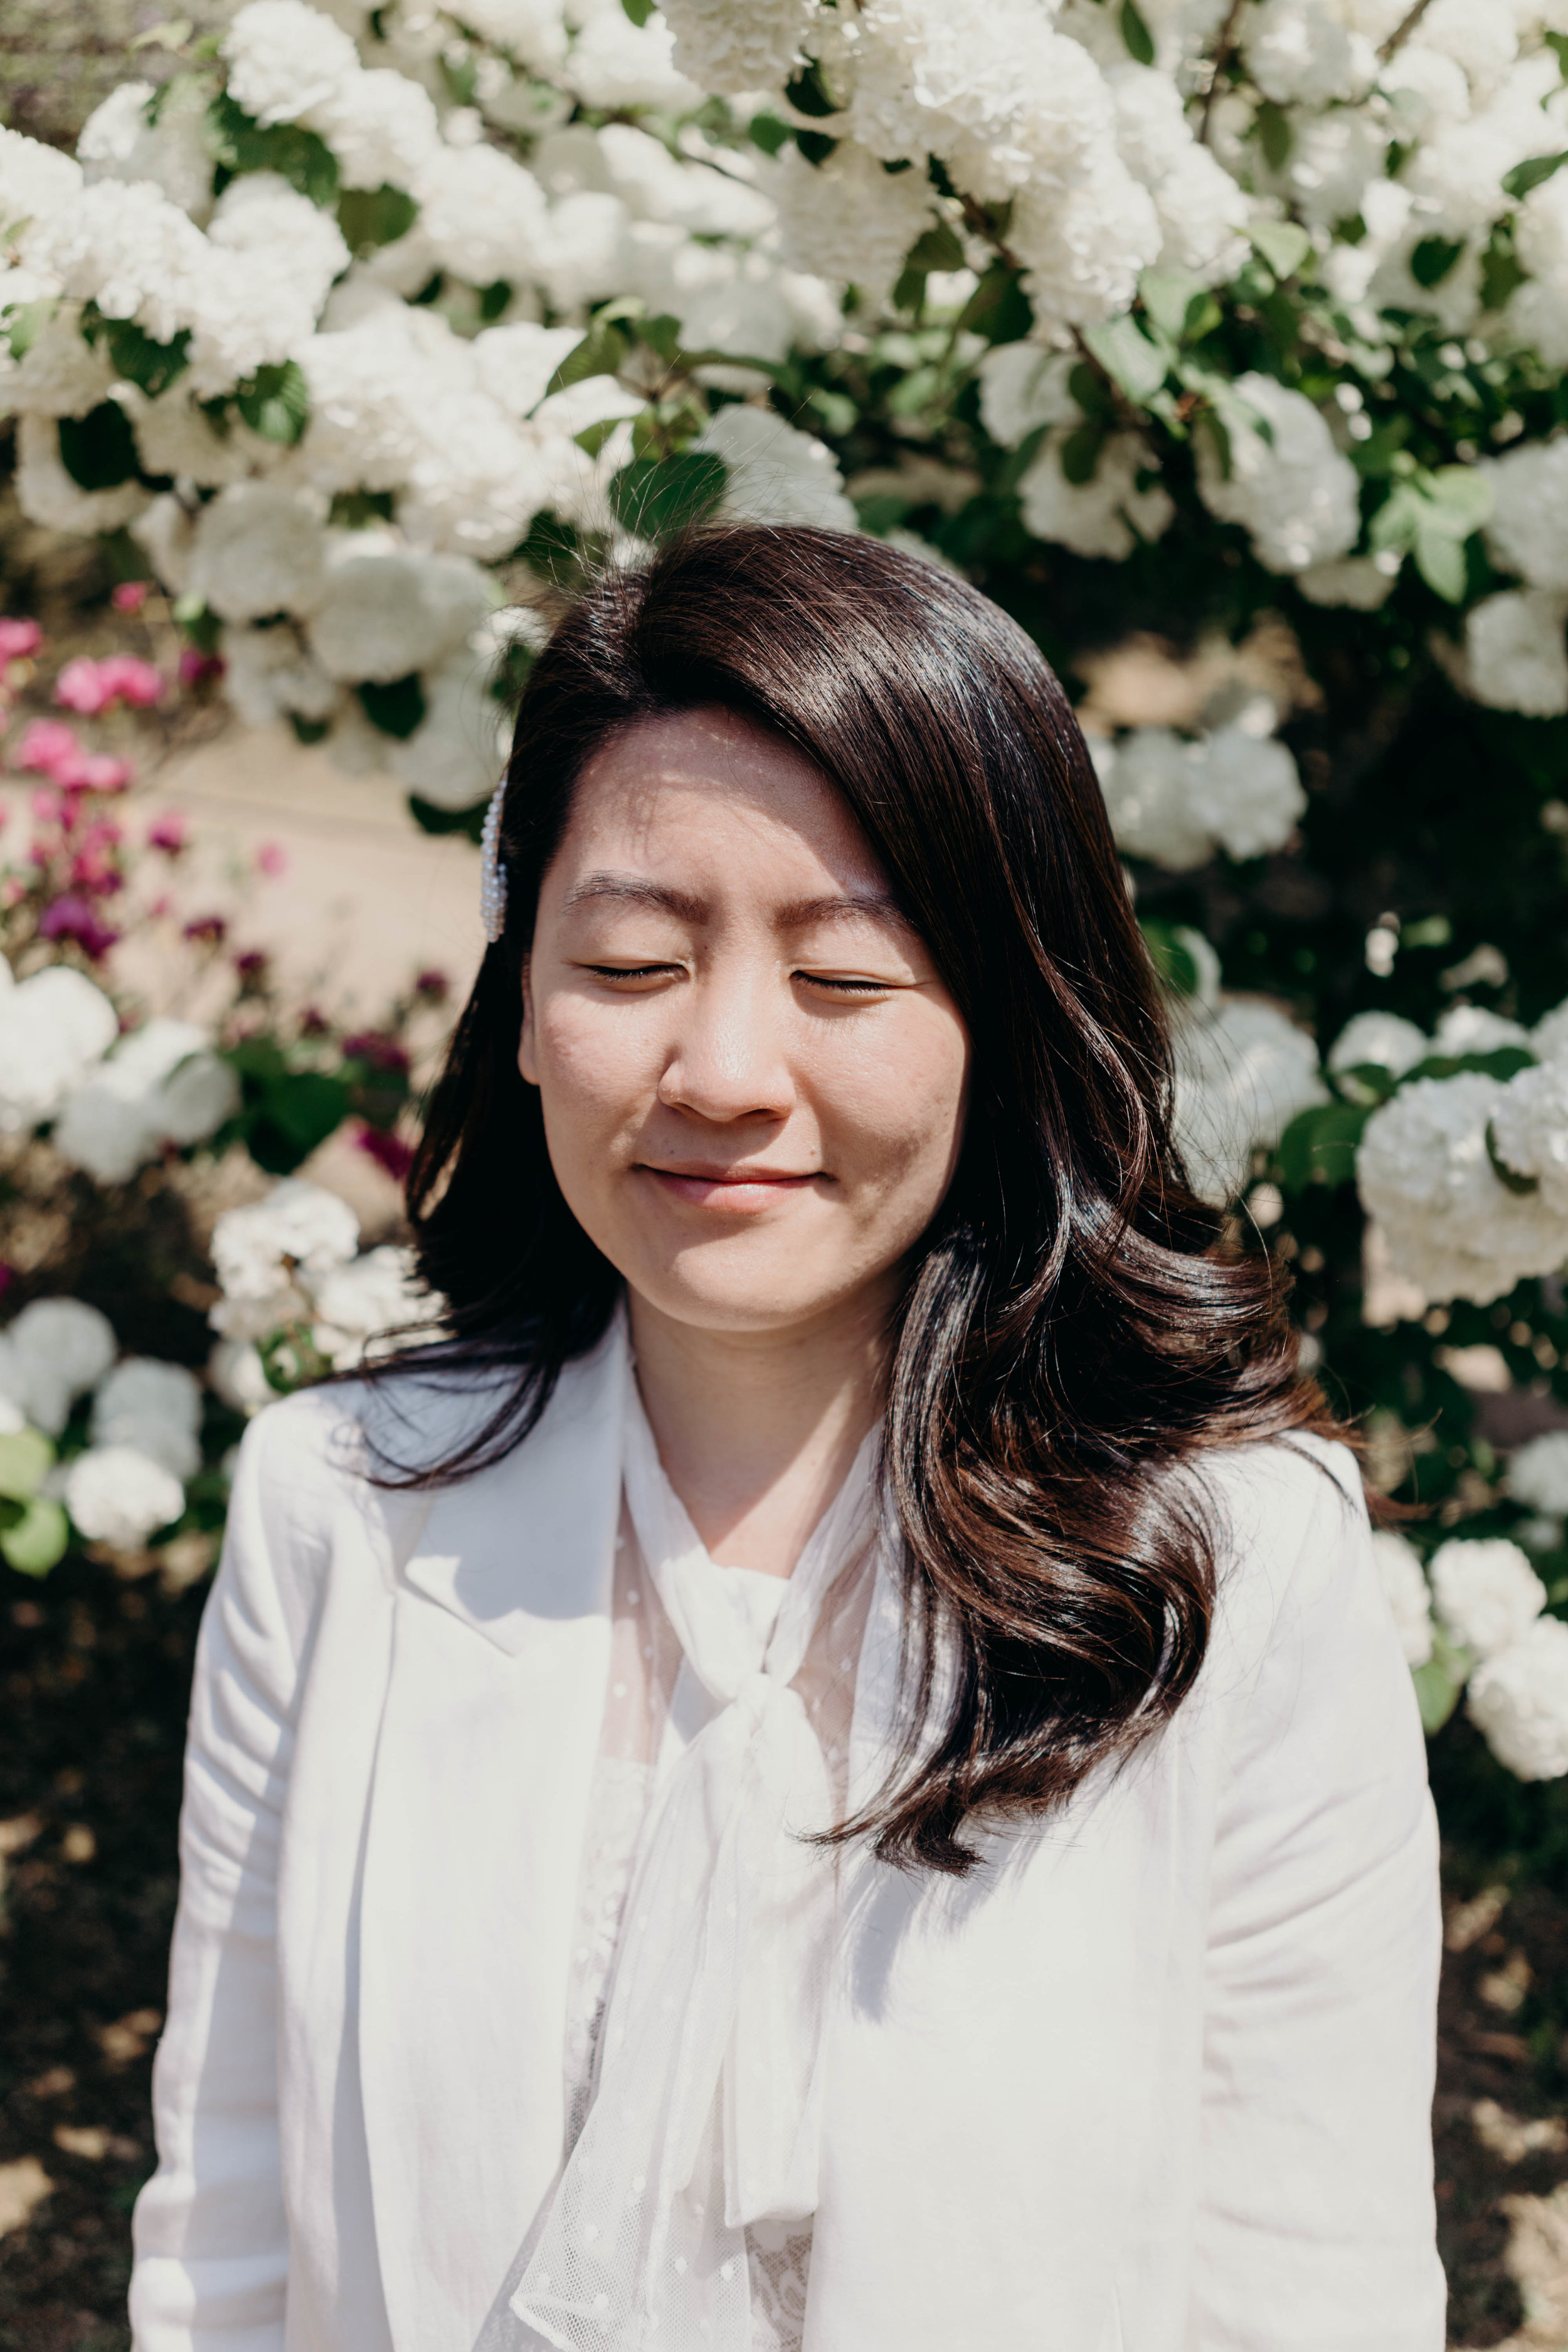 Bucket List Travels | On the Street Where We Live ( aretherelilactrees.com )  Kawachi Fuji Garden, Kitakyushu, Japan, Asia, wisteria, wisteria garden, wisteria tunnel, white blazer